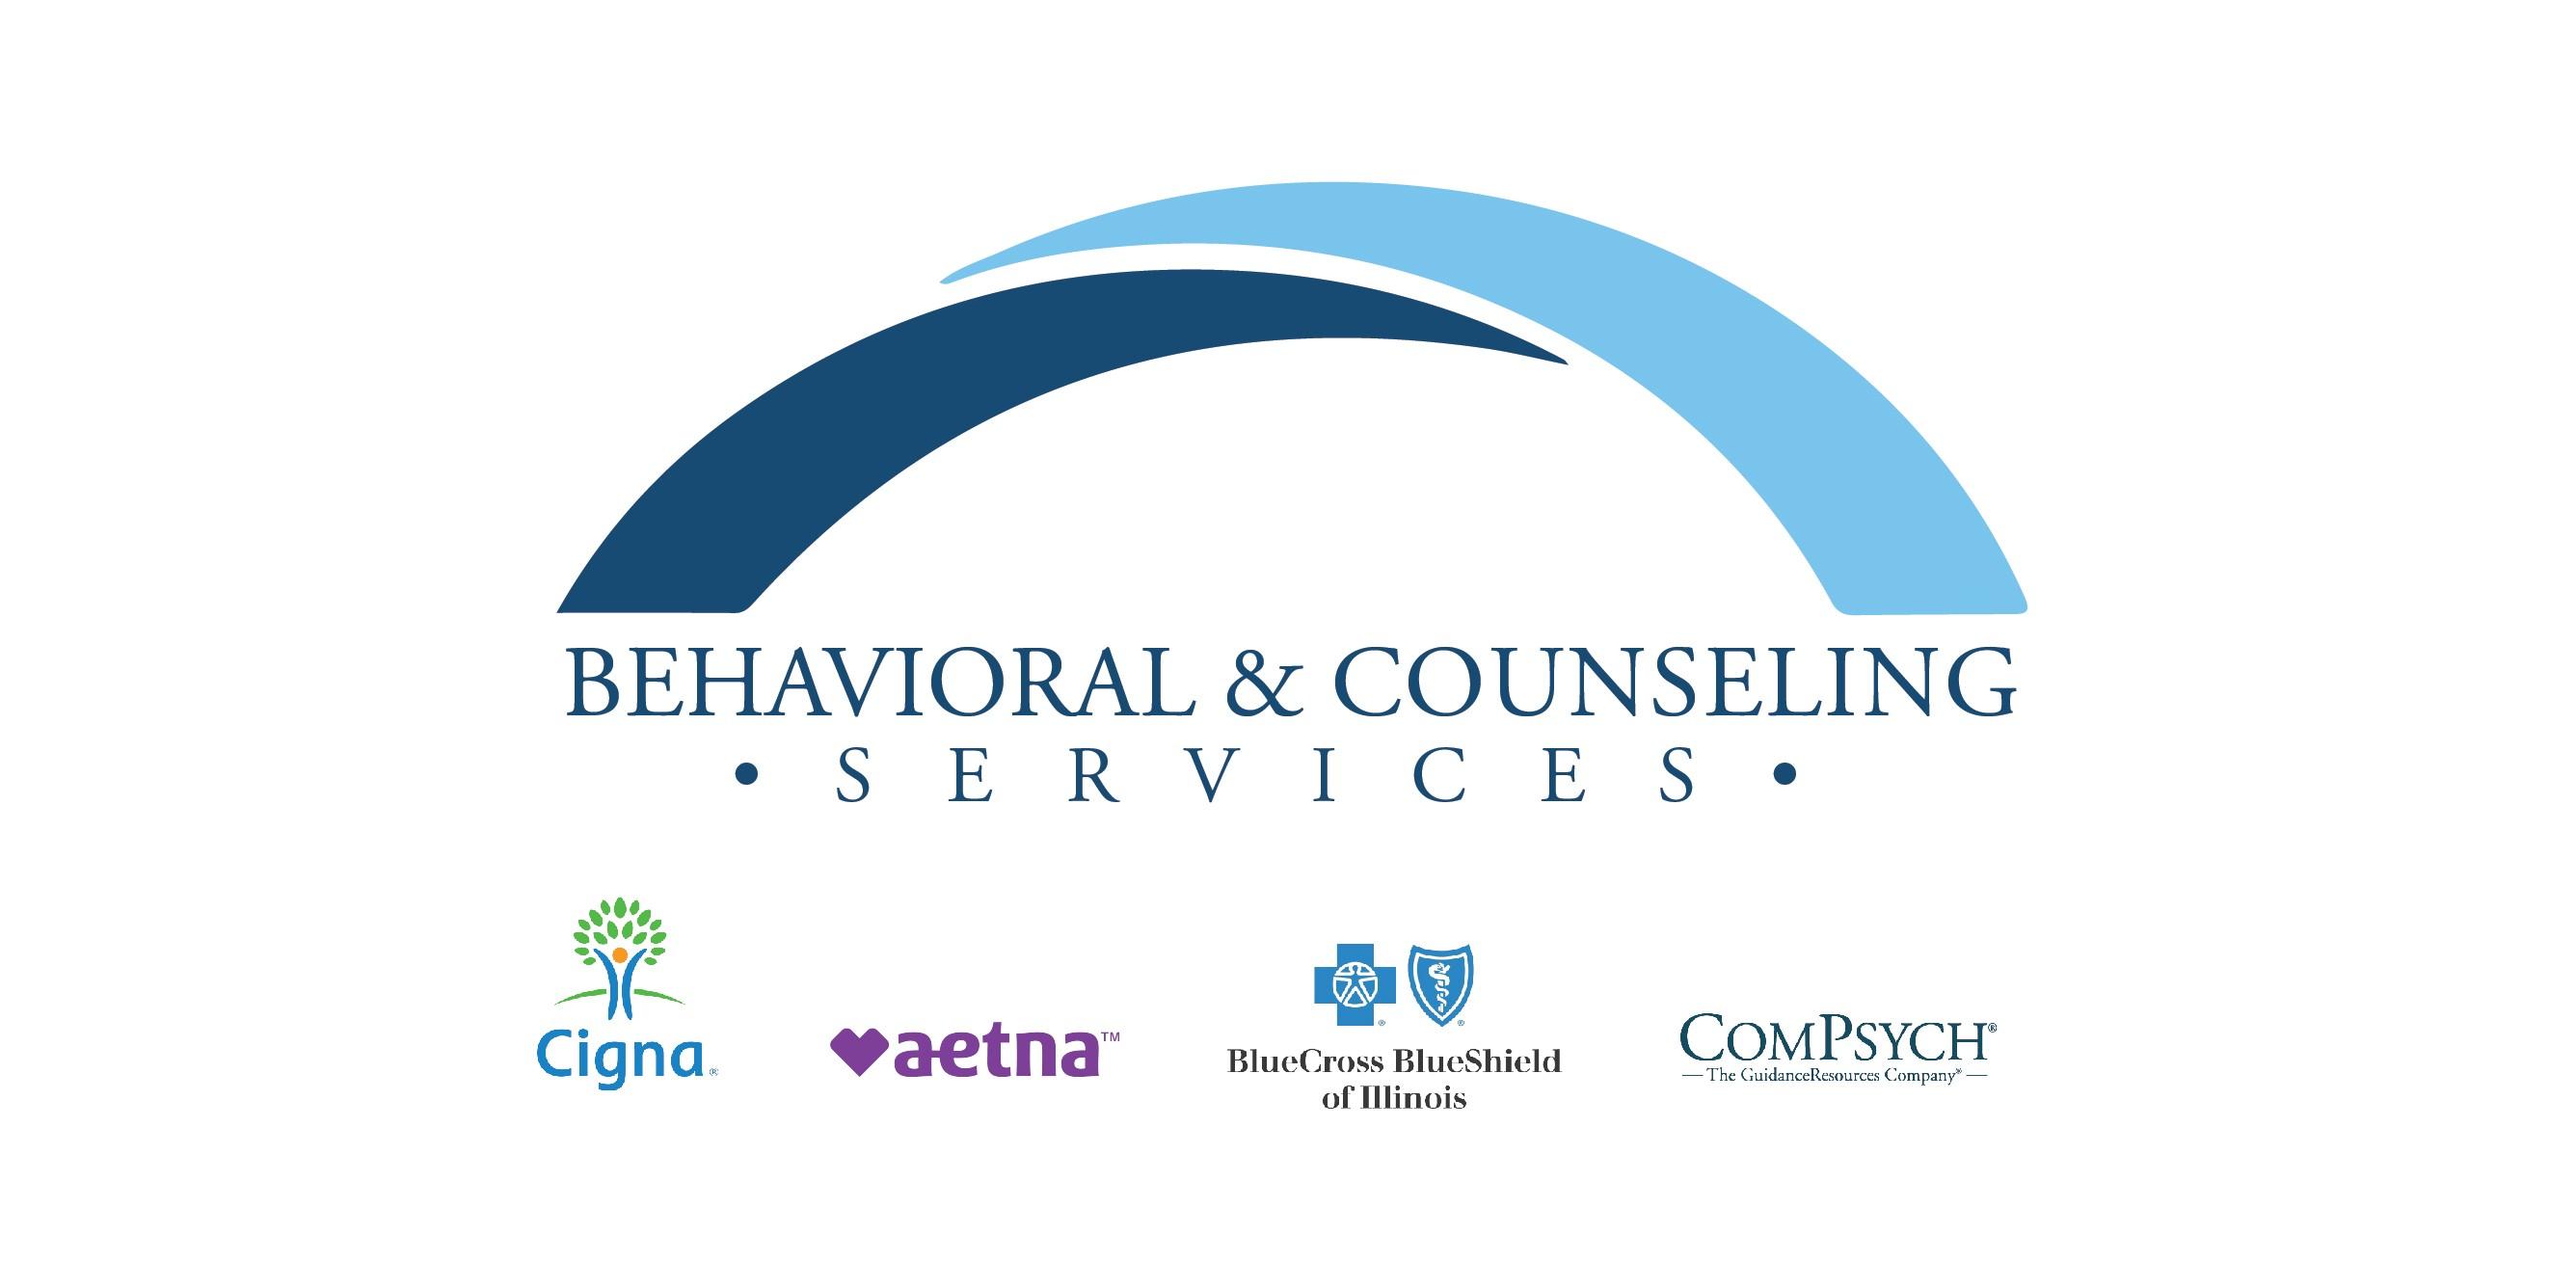 Behavioral & Counseling Services | LinkedIn